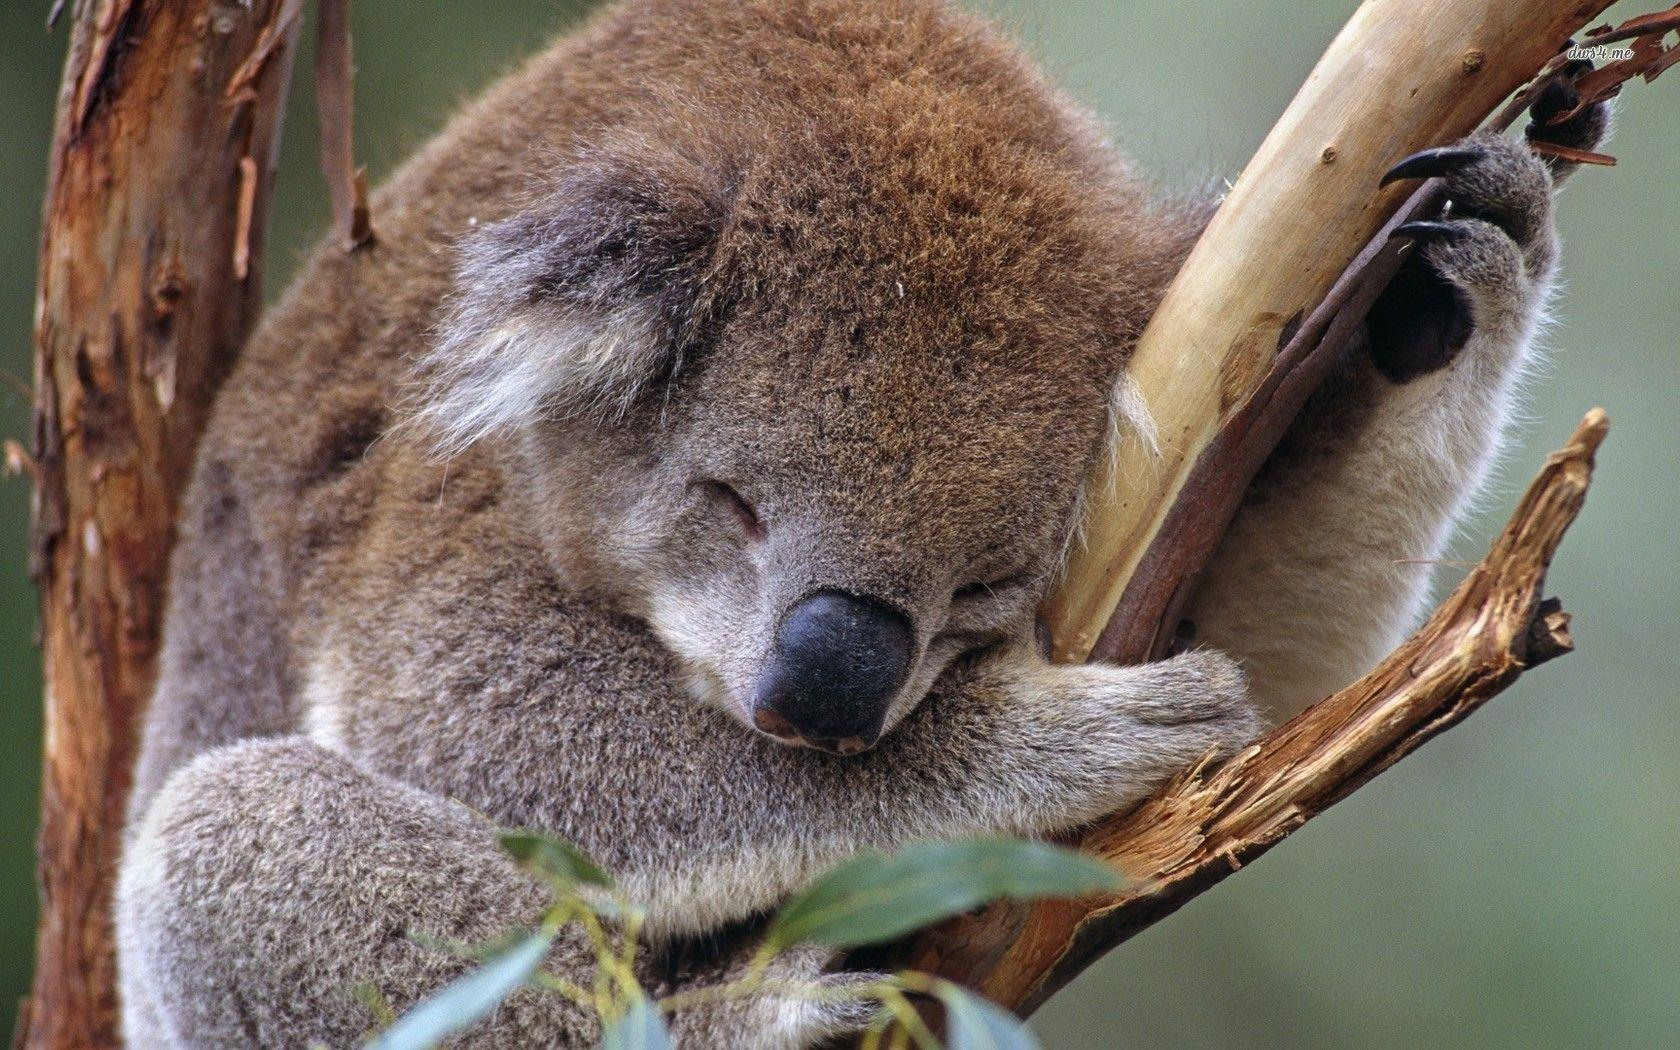 koala wallpapers wallpaper cave. Black Bedroom Furniture Sets. Home Design Ideas